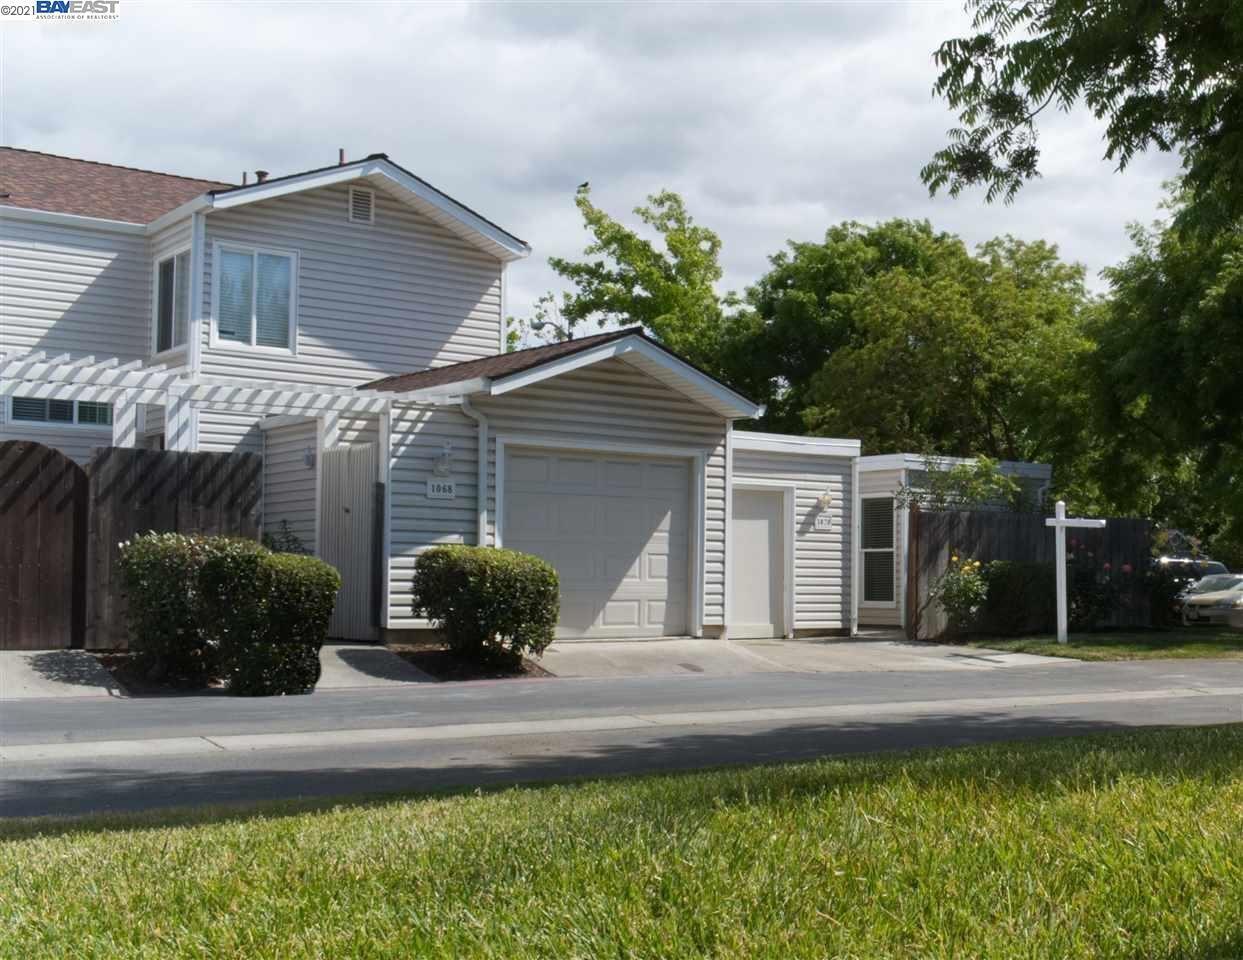 Photo of 1070 Glenn Common, LIVERMORE, CA 94511 (MLS # 40960583)